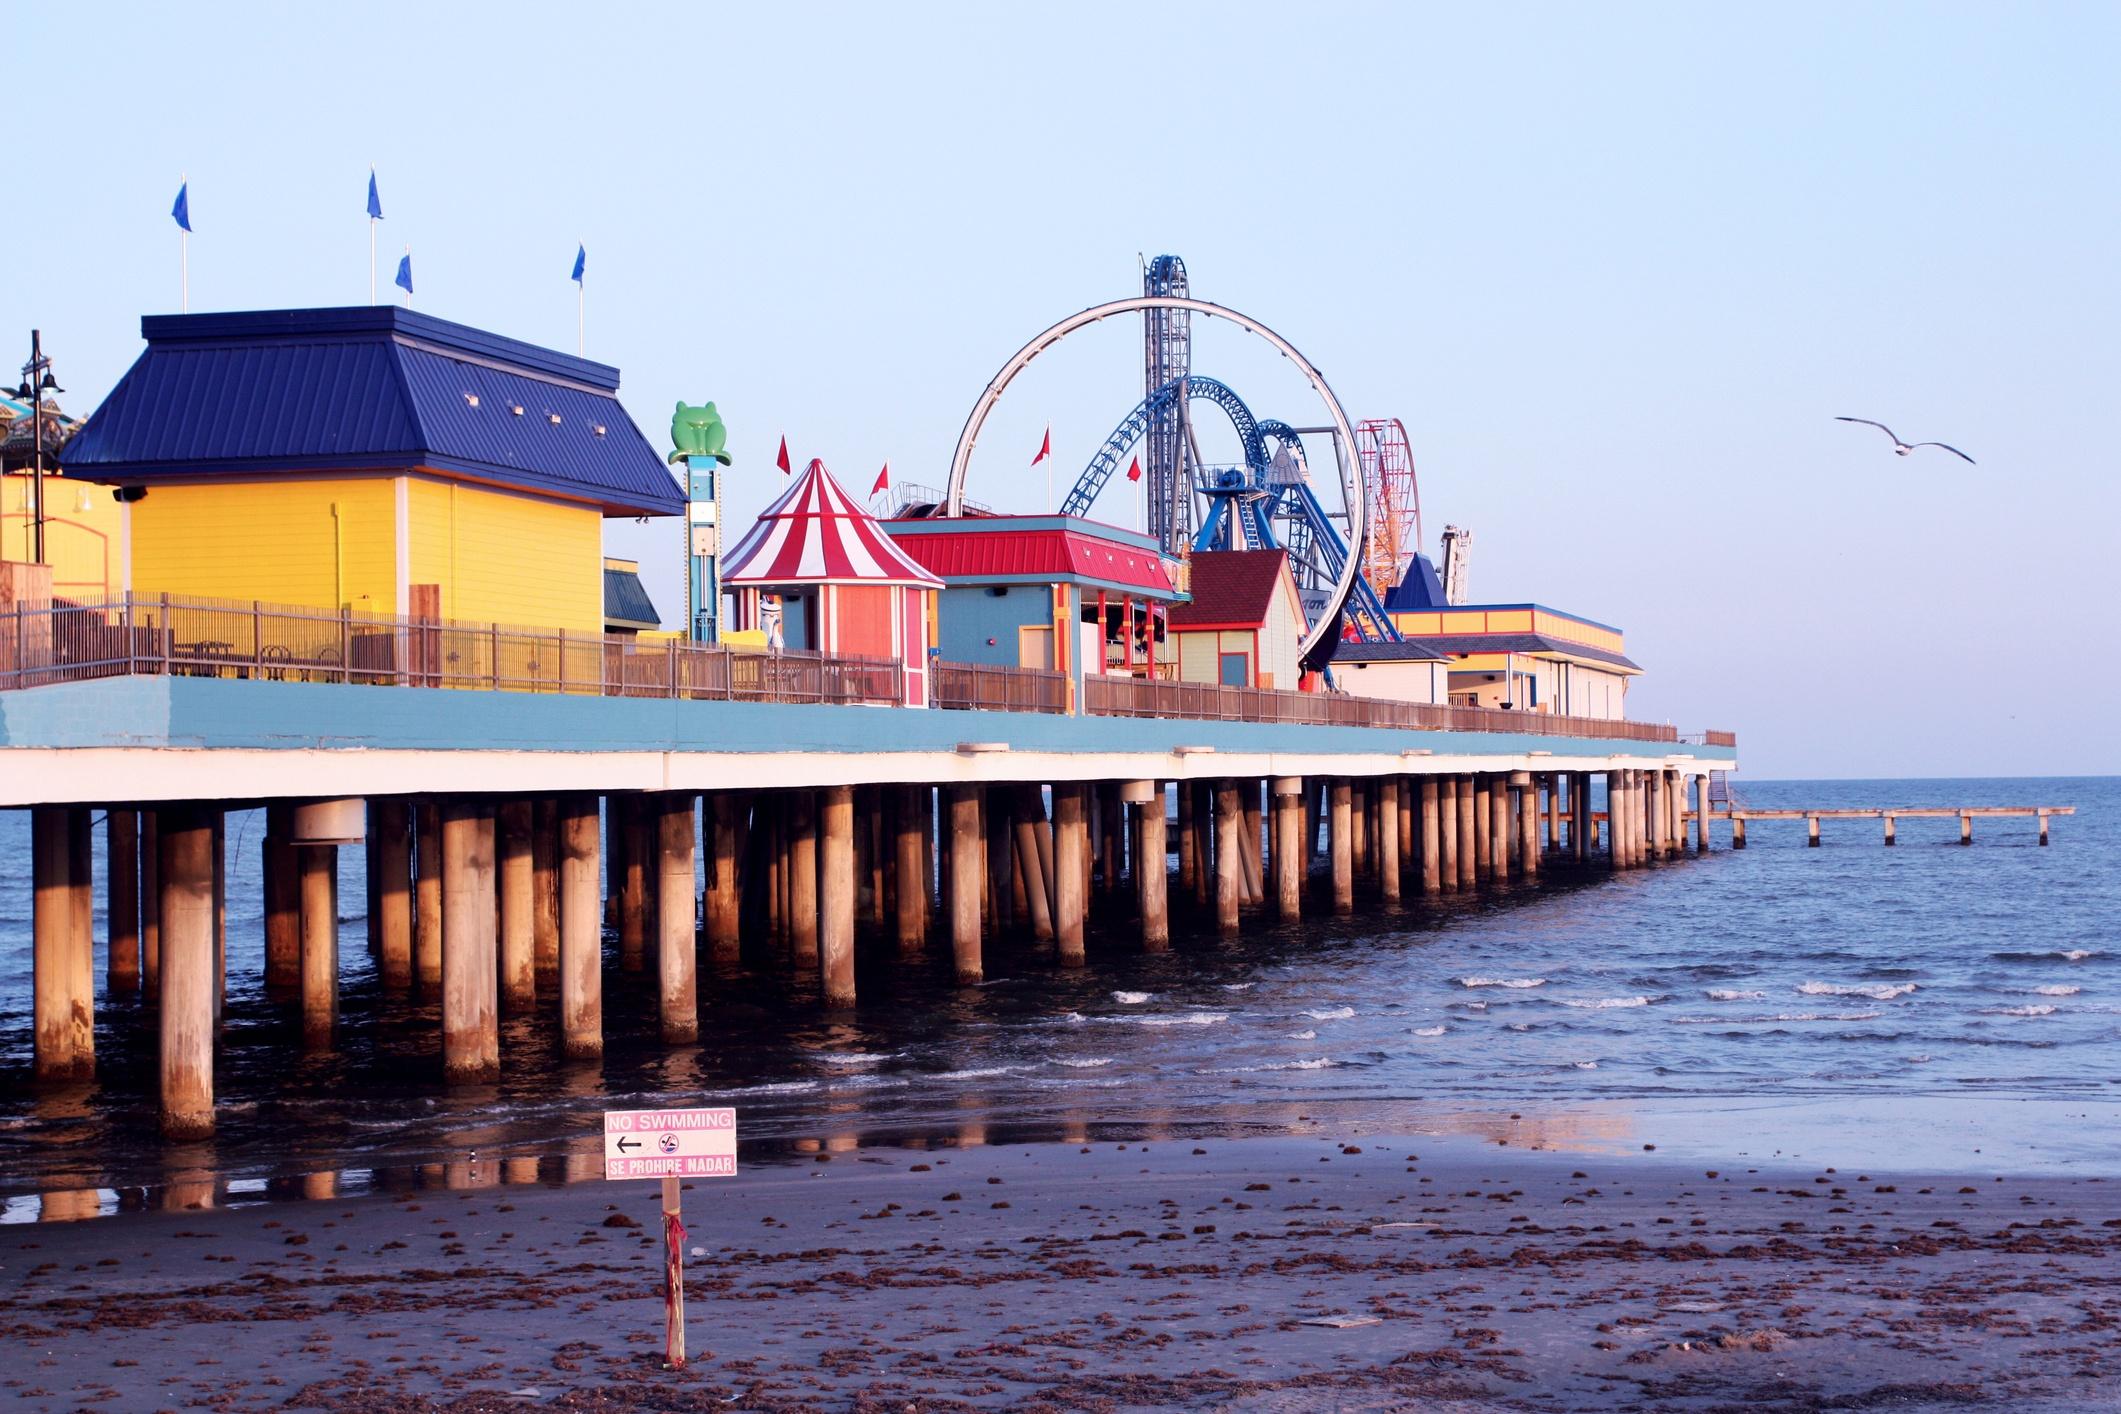 Galveston Texas boardwalk